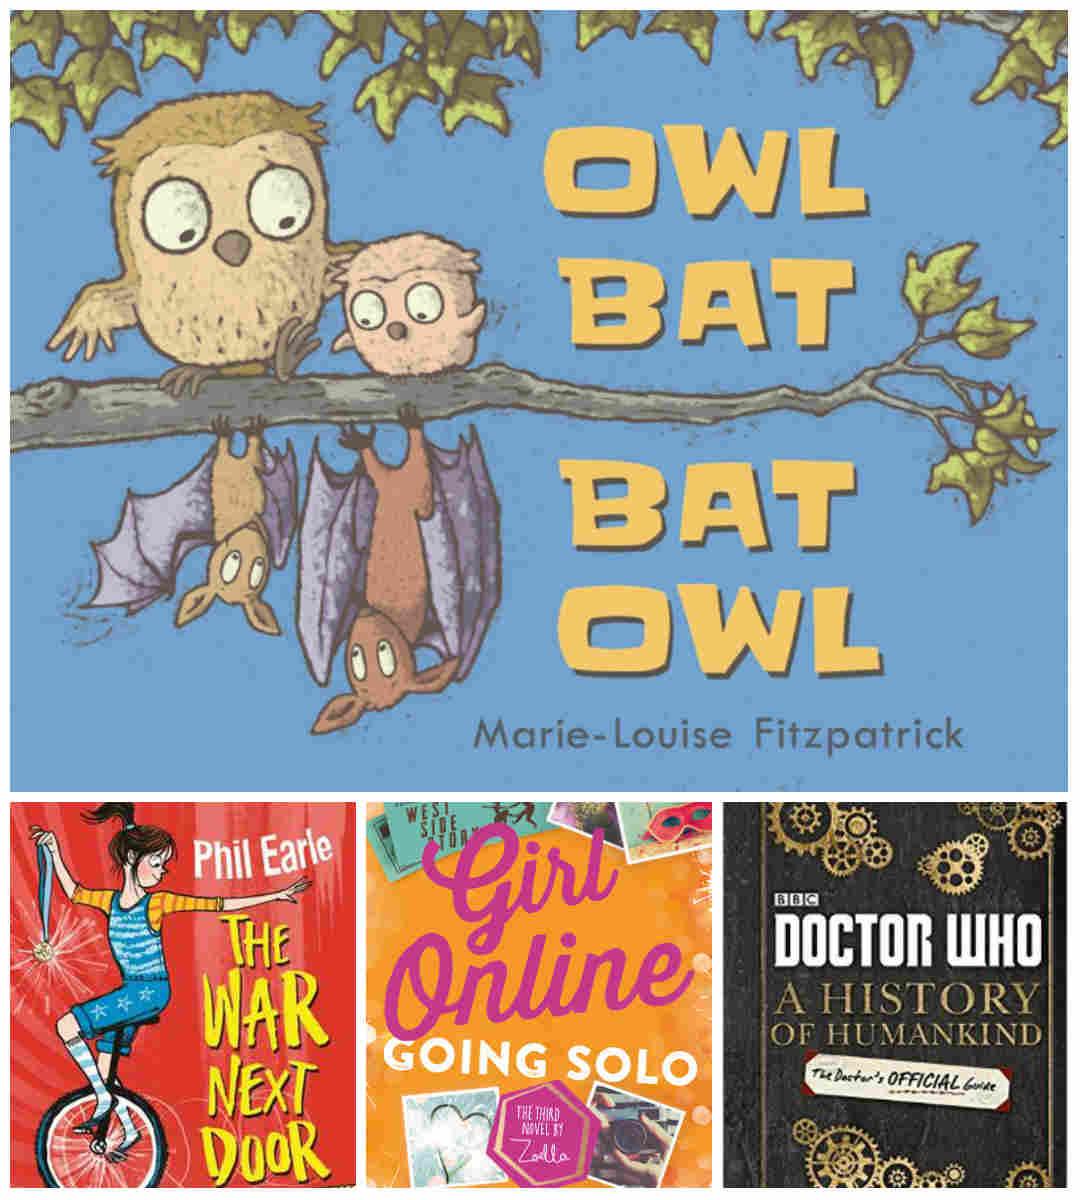 Owl Bat Bat Owl, The War Next Door